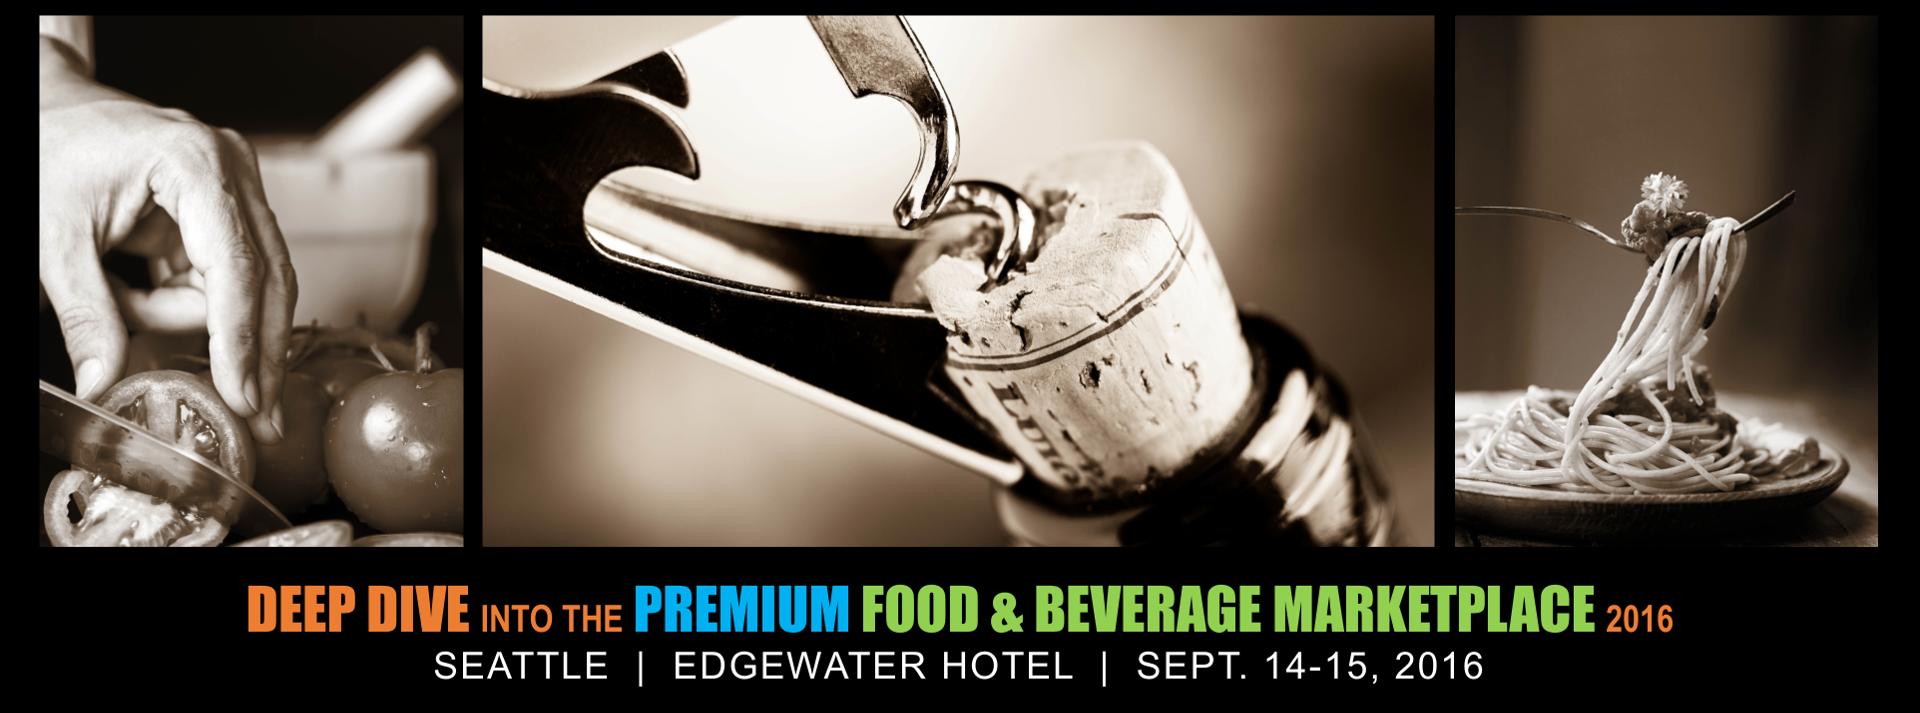 Premium Food & Beverage Marketplace